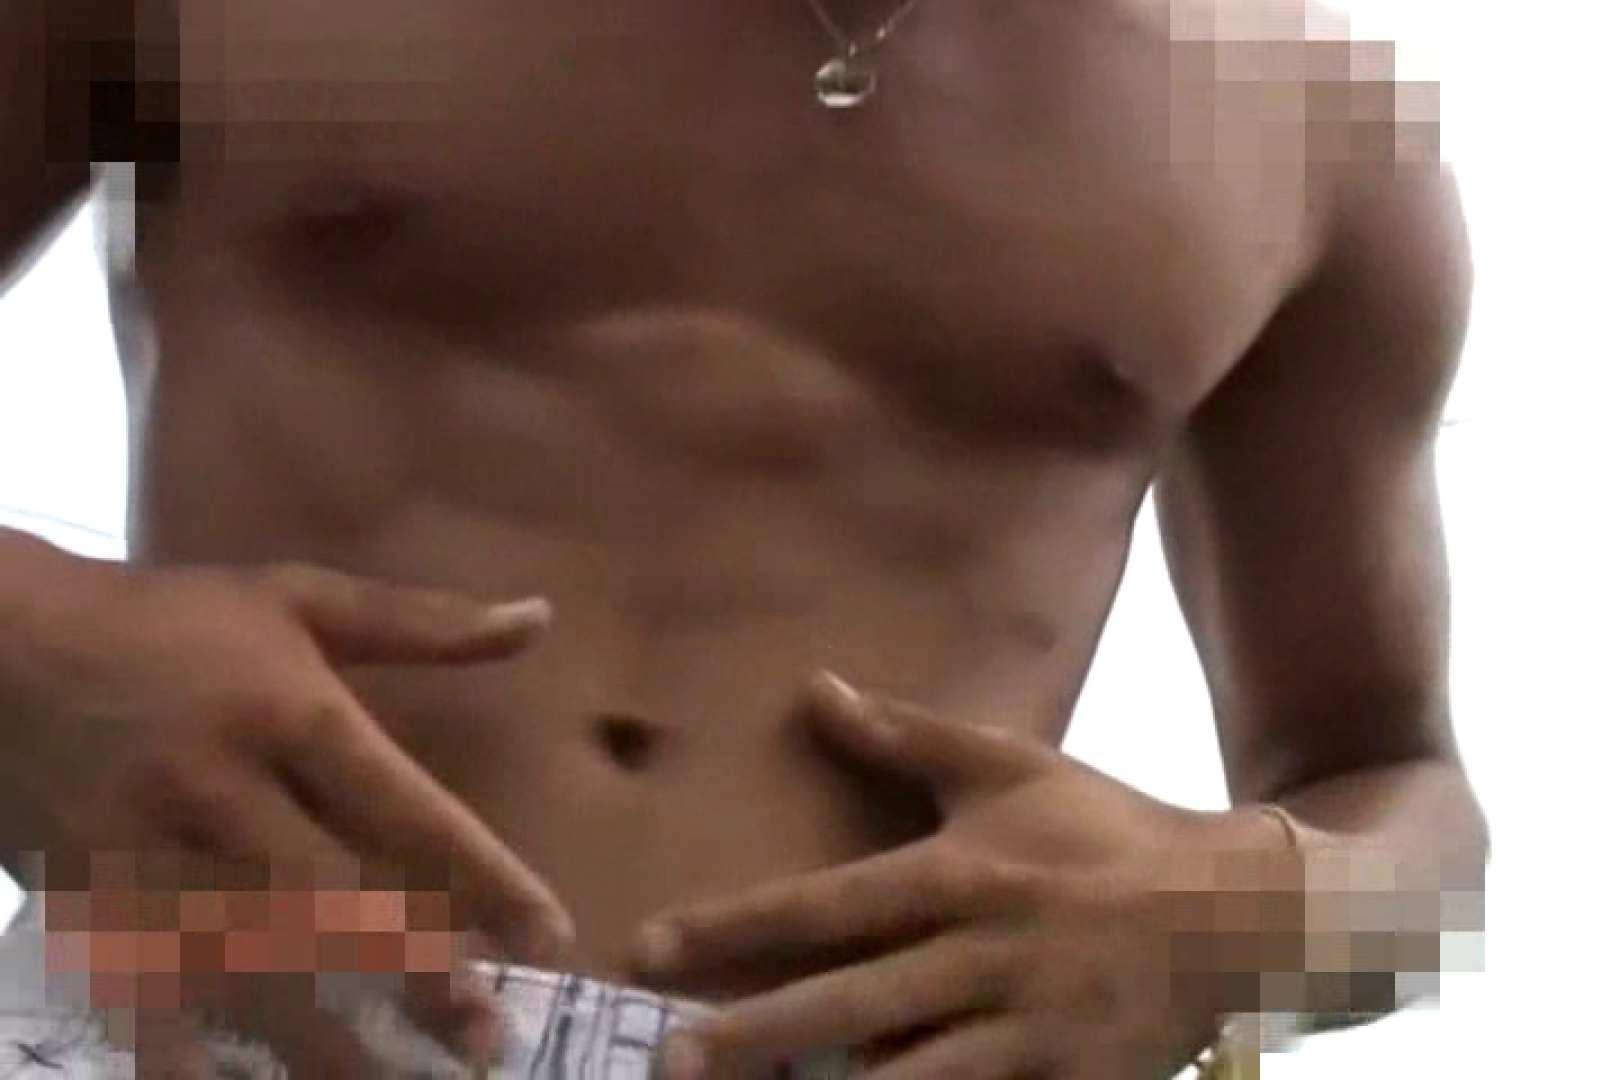 Beautiful muscle モッコリ野郎達!Vol.12 スジ筋系男子 ゲイセックス画像 77枚 37